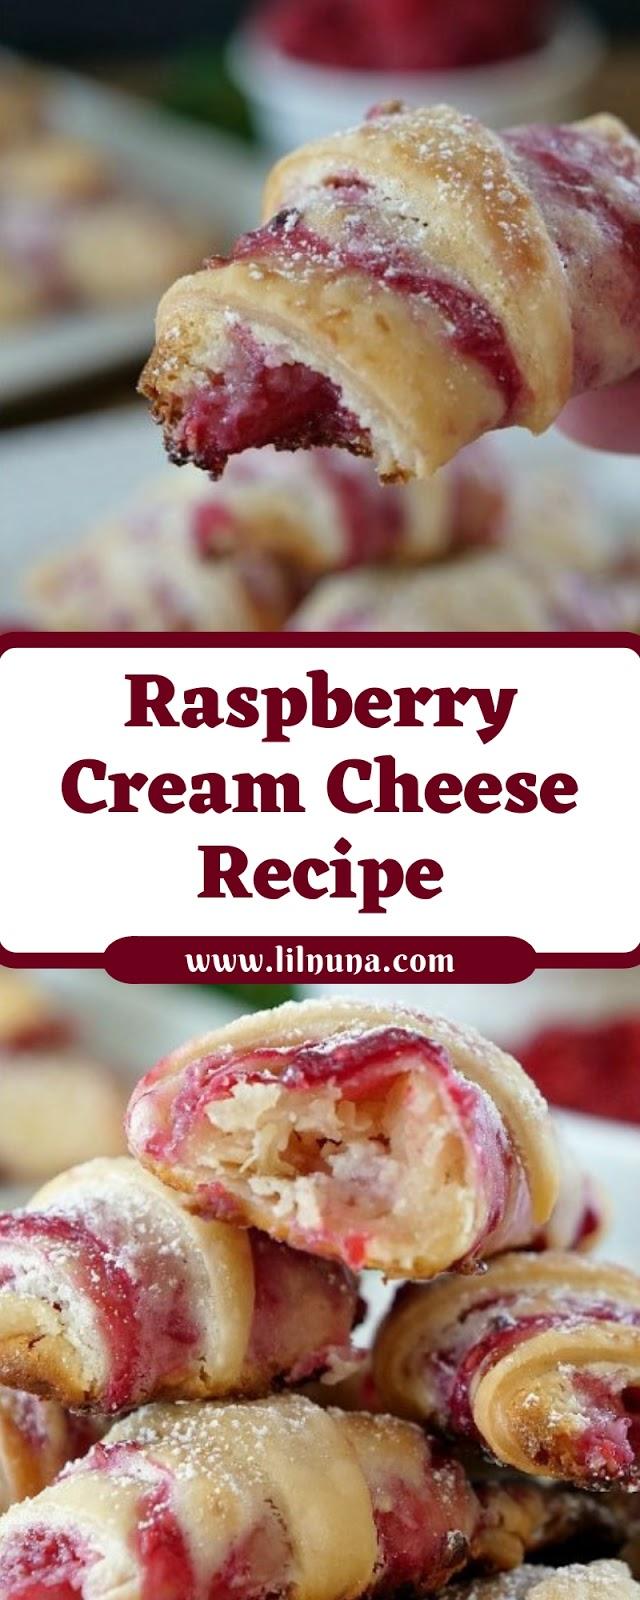 Raspberry Cream Cheese Recipe